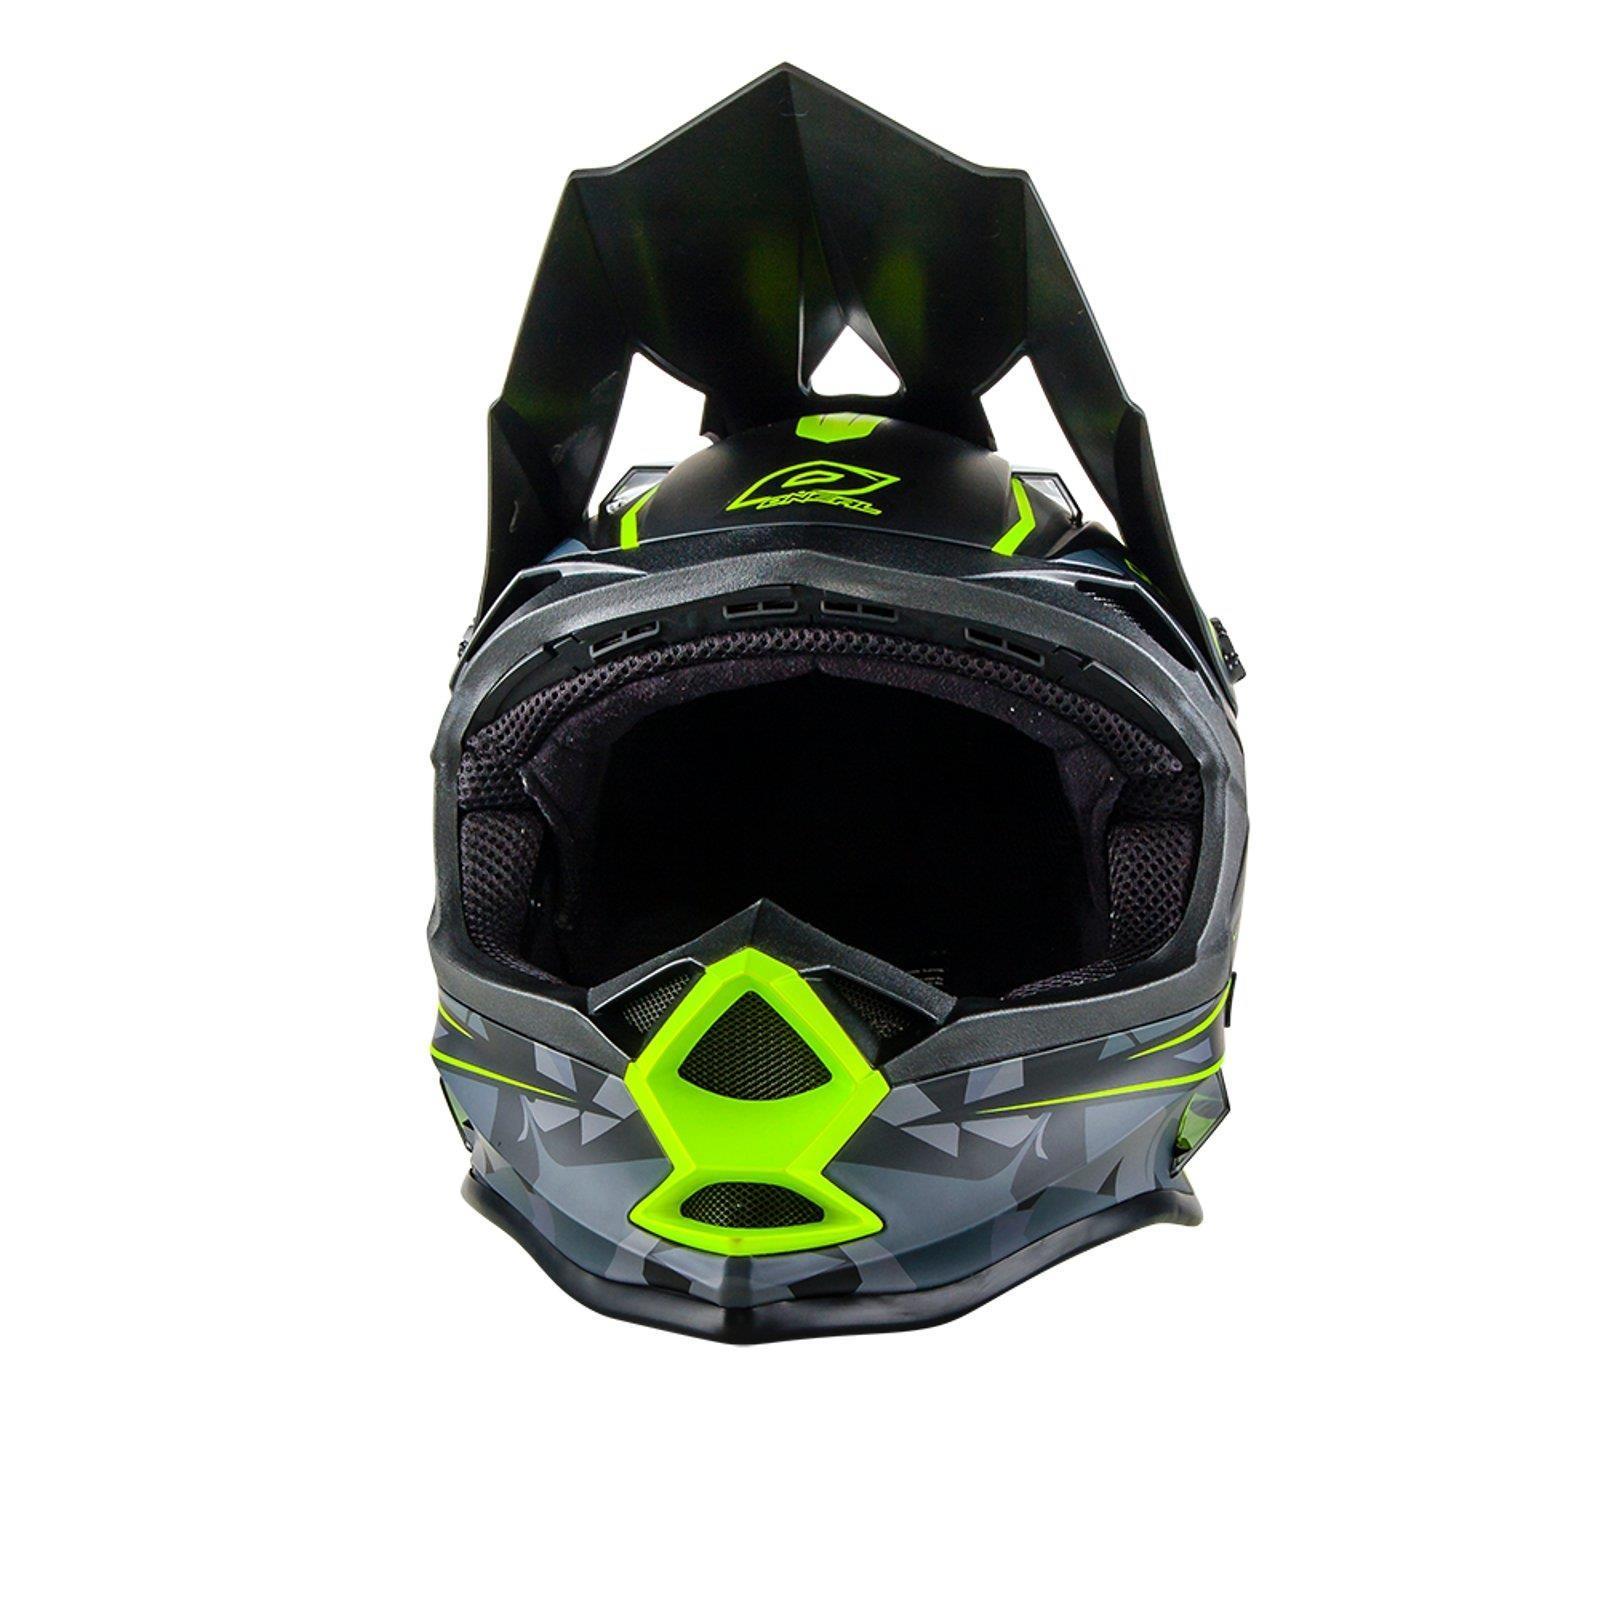 ONeal-Motocross-casco-MX-ENDURO-MOTO-BICI-FUORISTRADA-CROSS-Series-Adventure miniatura 128